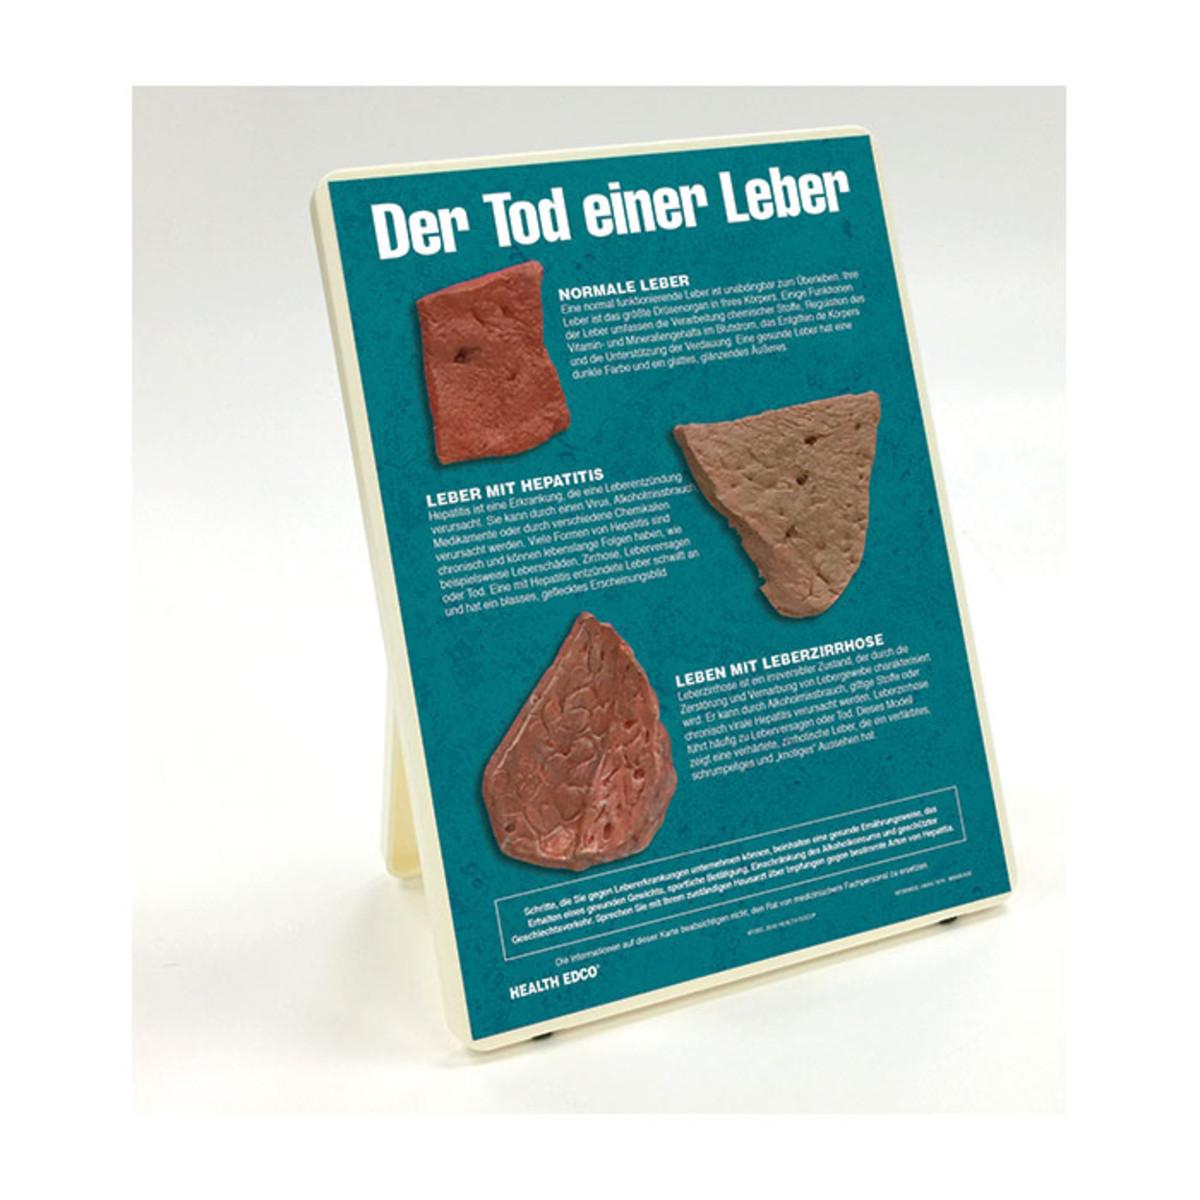 Health Edco; German; health education products; liver disease; hepatitis; cirrhotic liver; alcohol abuse